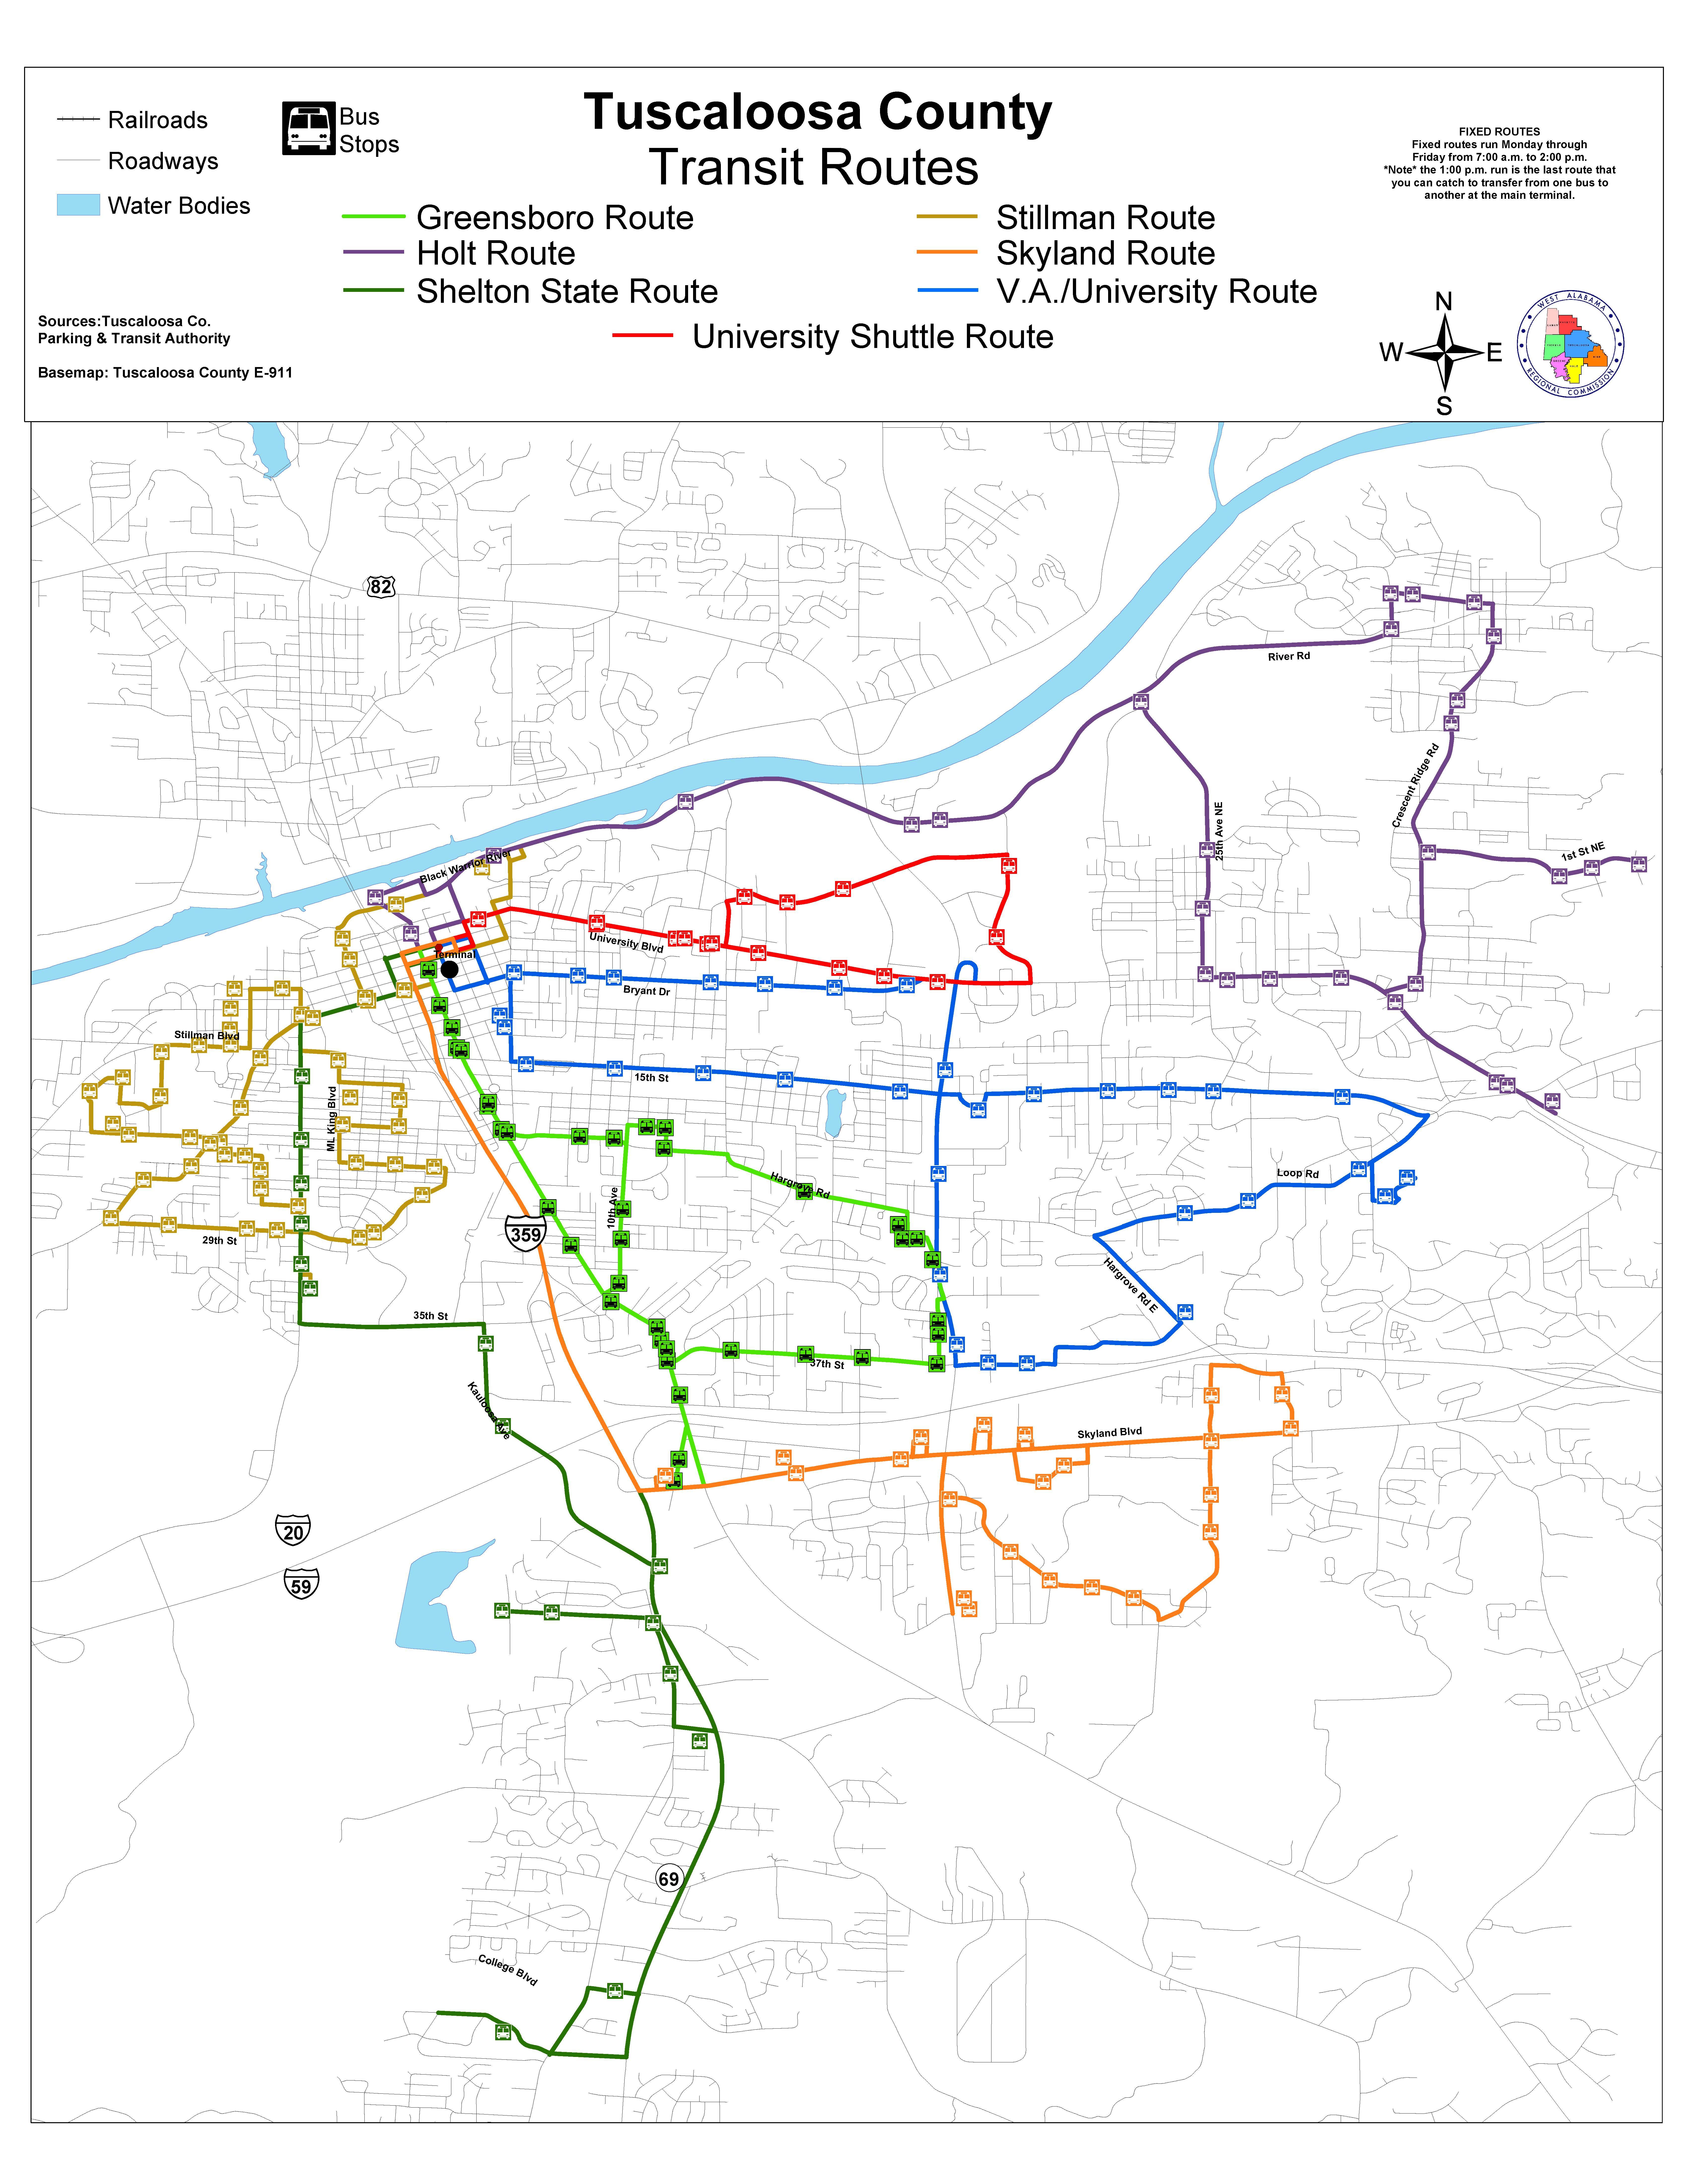 Tuscaloosa Transit Authority - Route Information